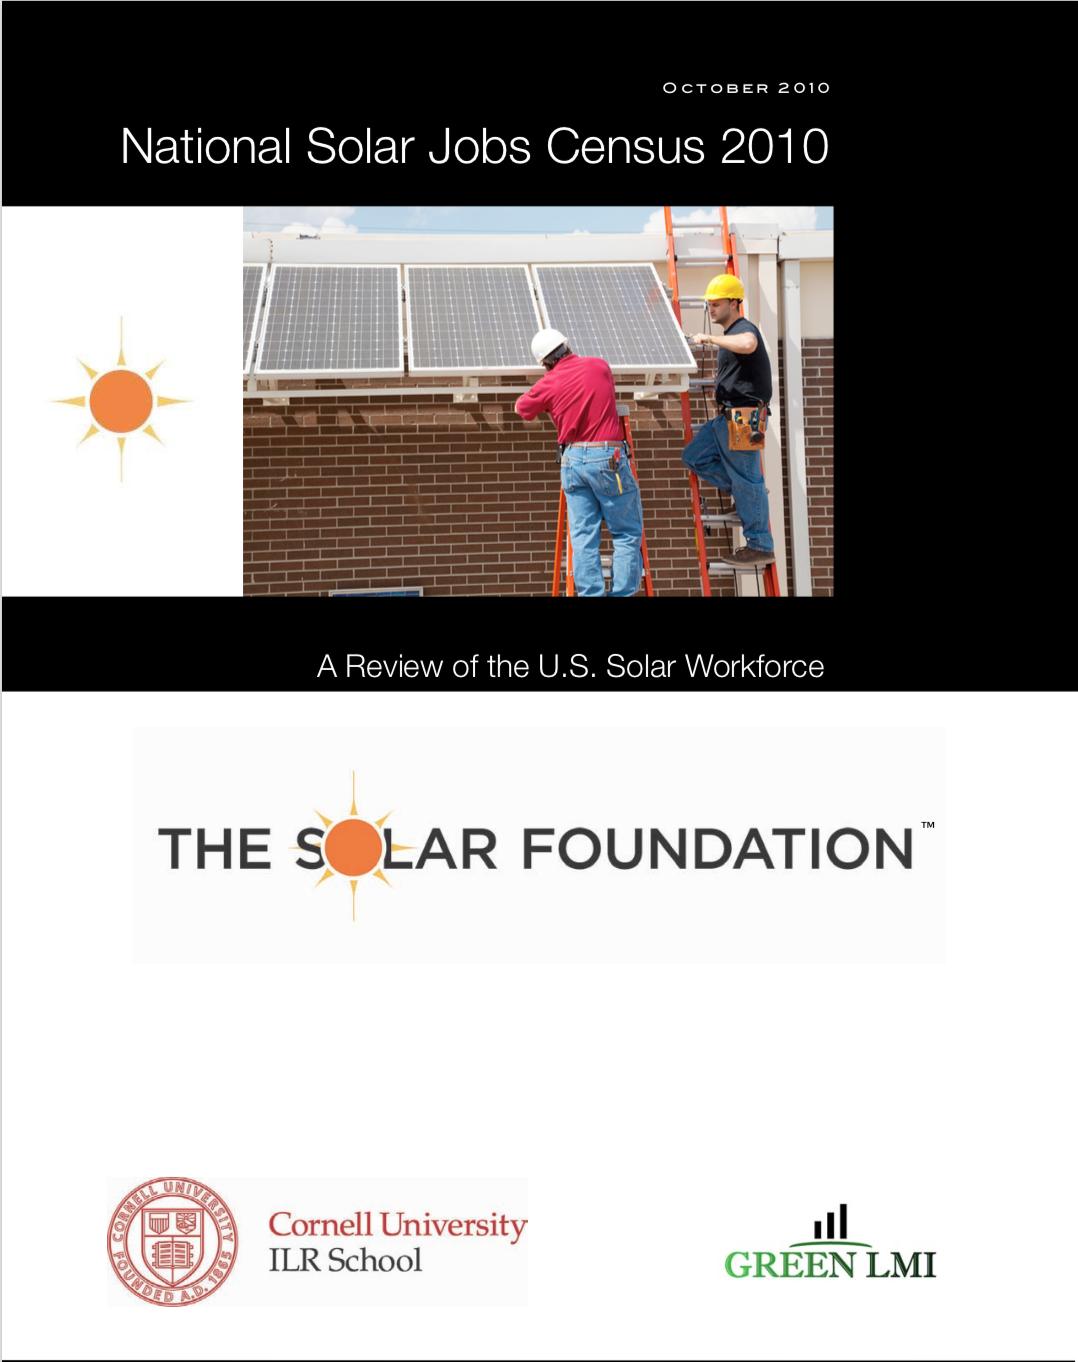 National Solar Jobs Census 2010